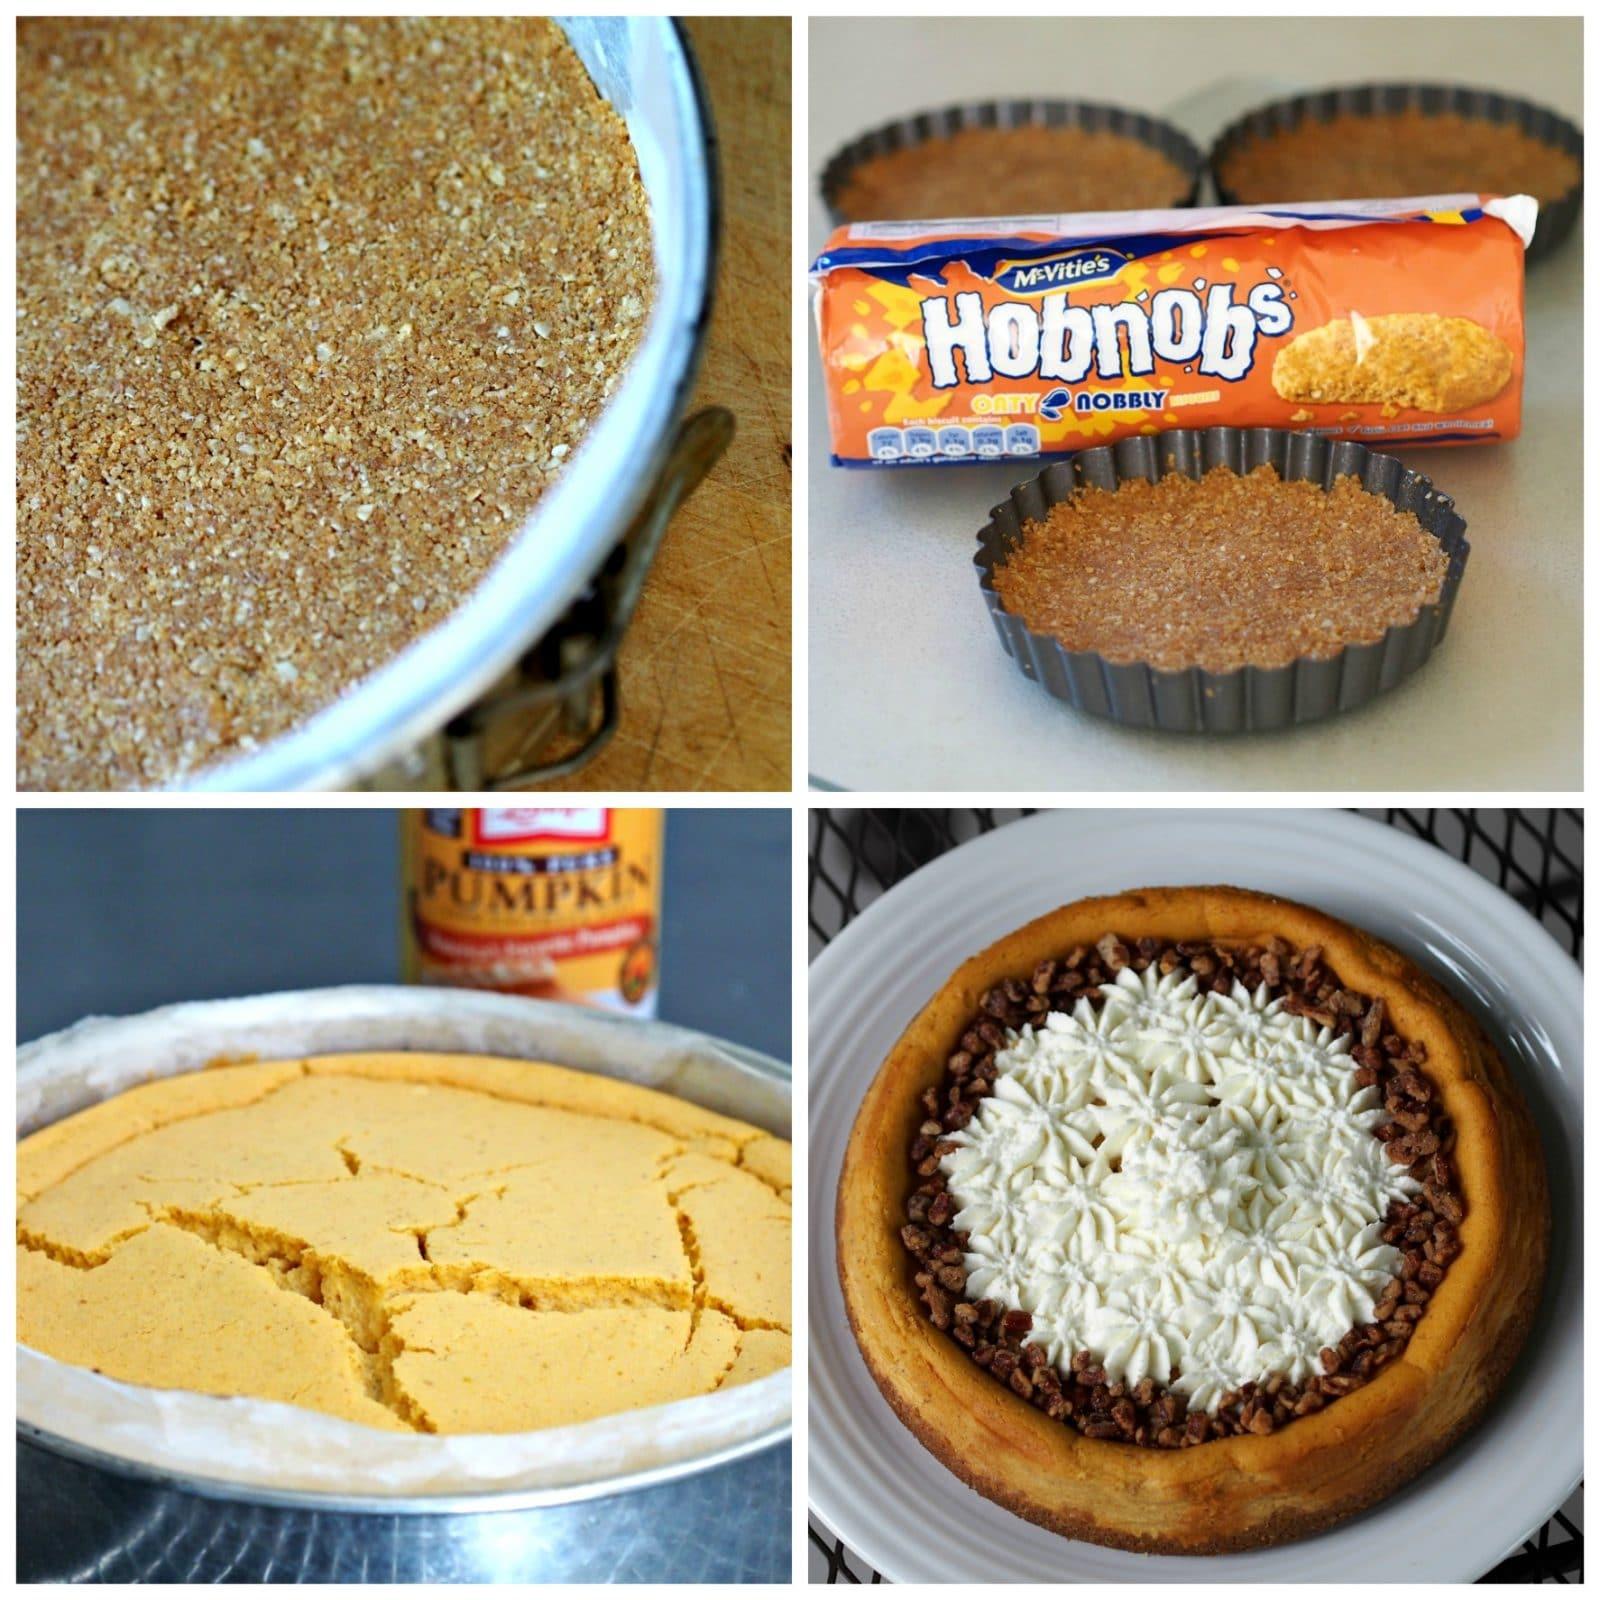 Pumpkin PIe Cheesecake - creamy pumpkin cheesecake topped with mascarpone whipped cream - YUM! simplysated